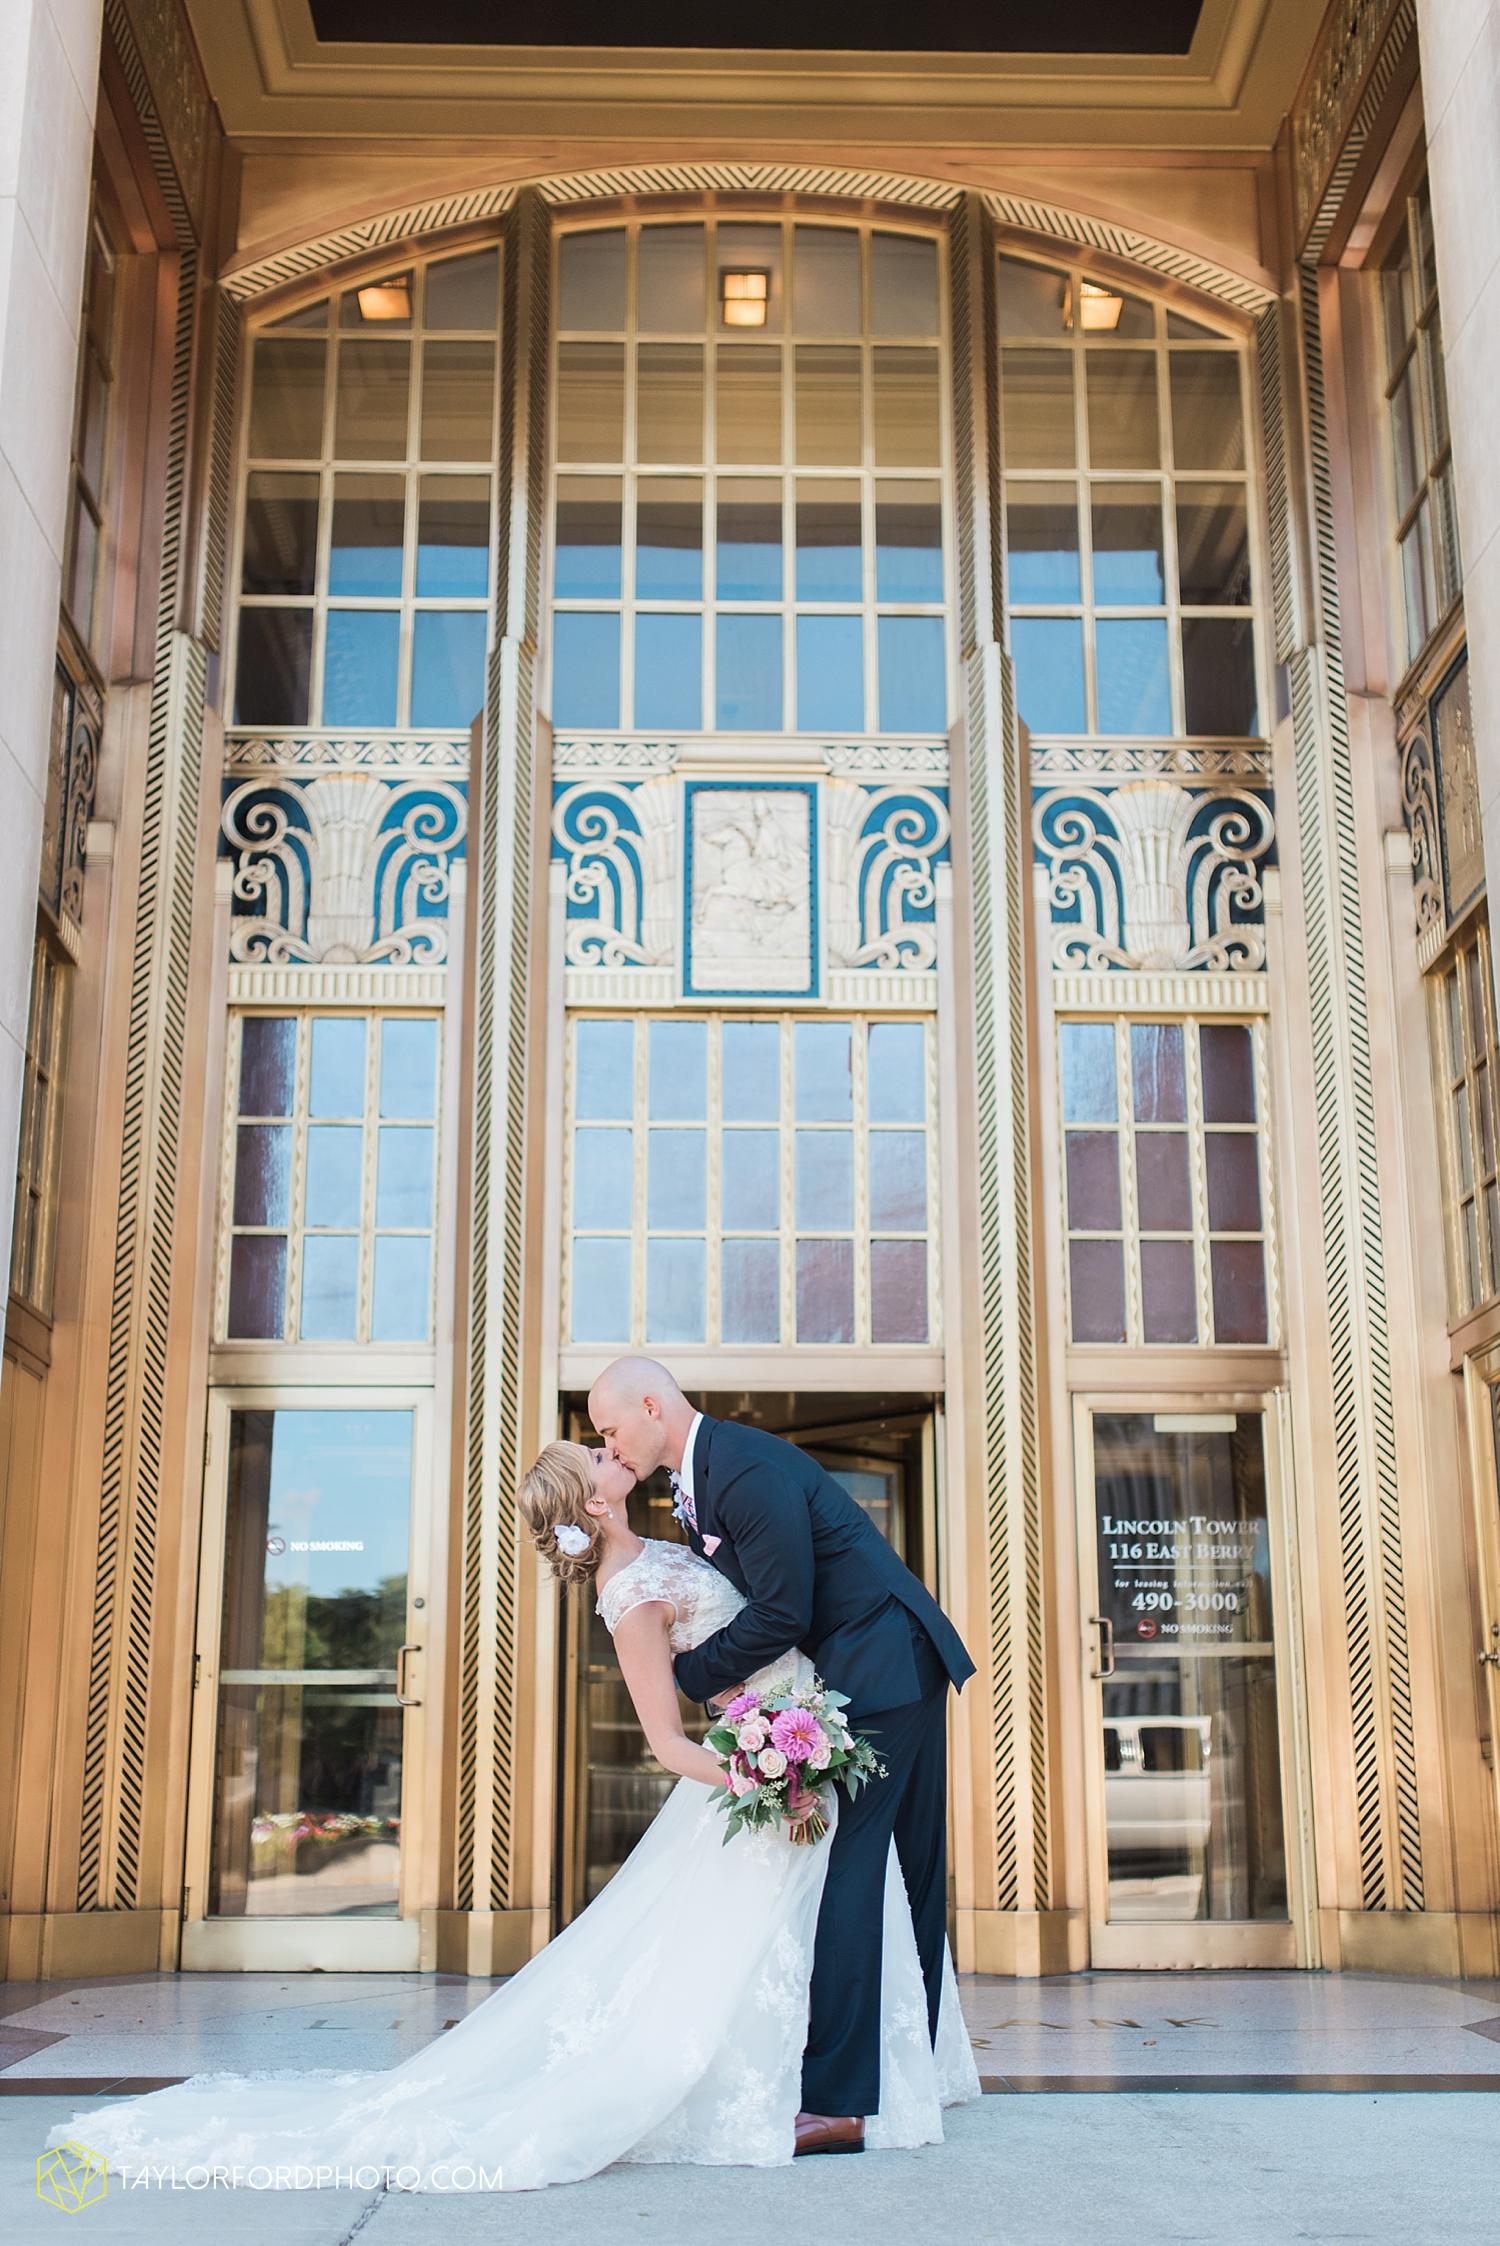 van_wert_ohio_fort_wayne_indiana__photographer_taylor_ford_nashville_tennessee_family_wedding_senior_cerutis_catering_2485.jpg